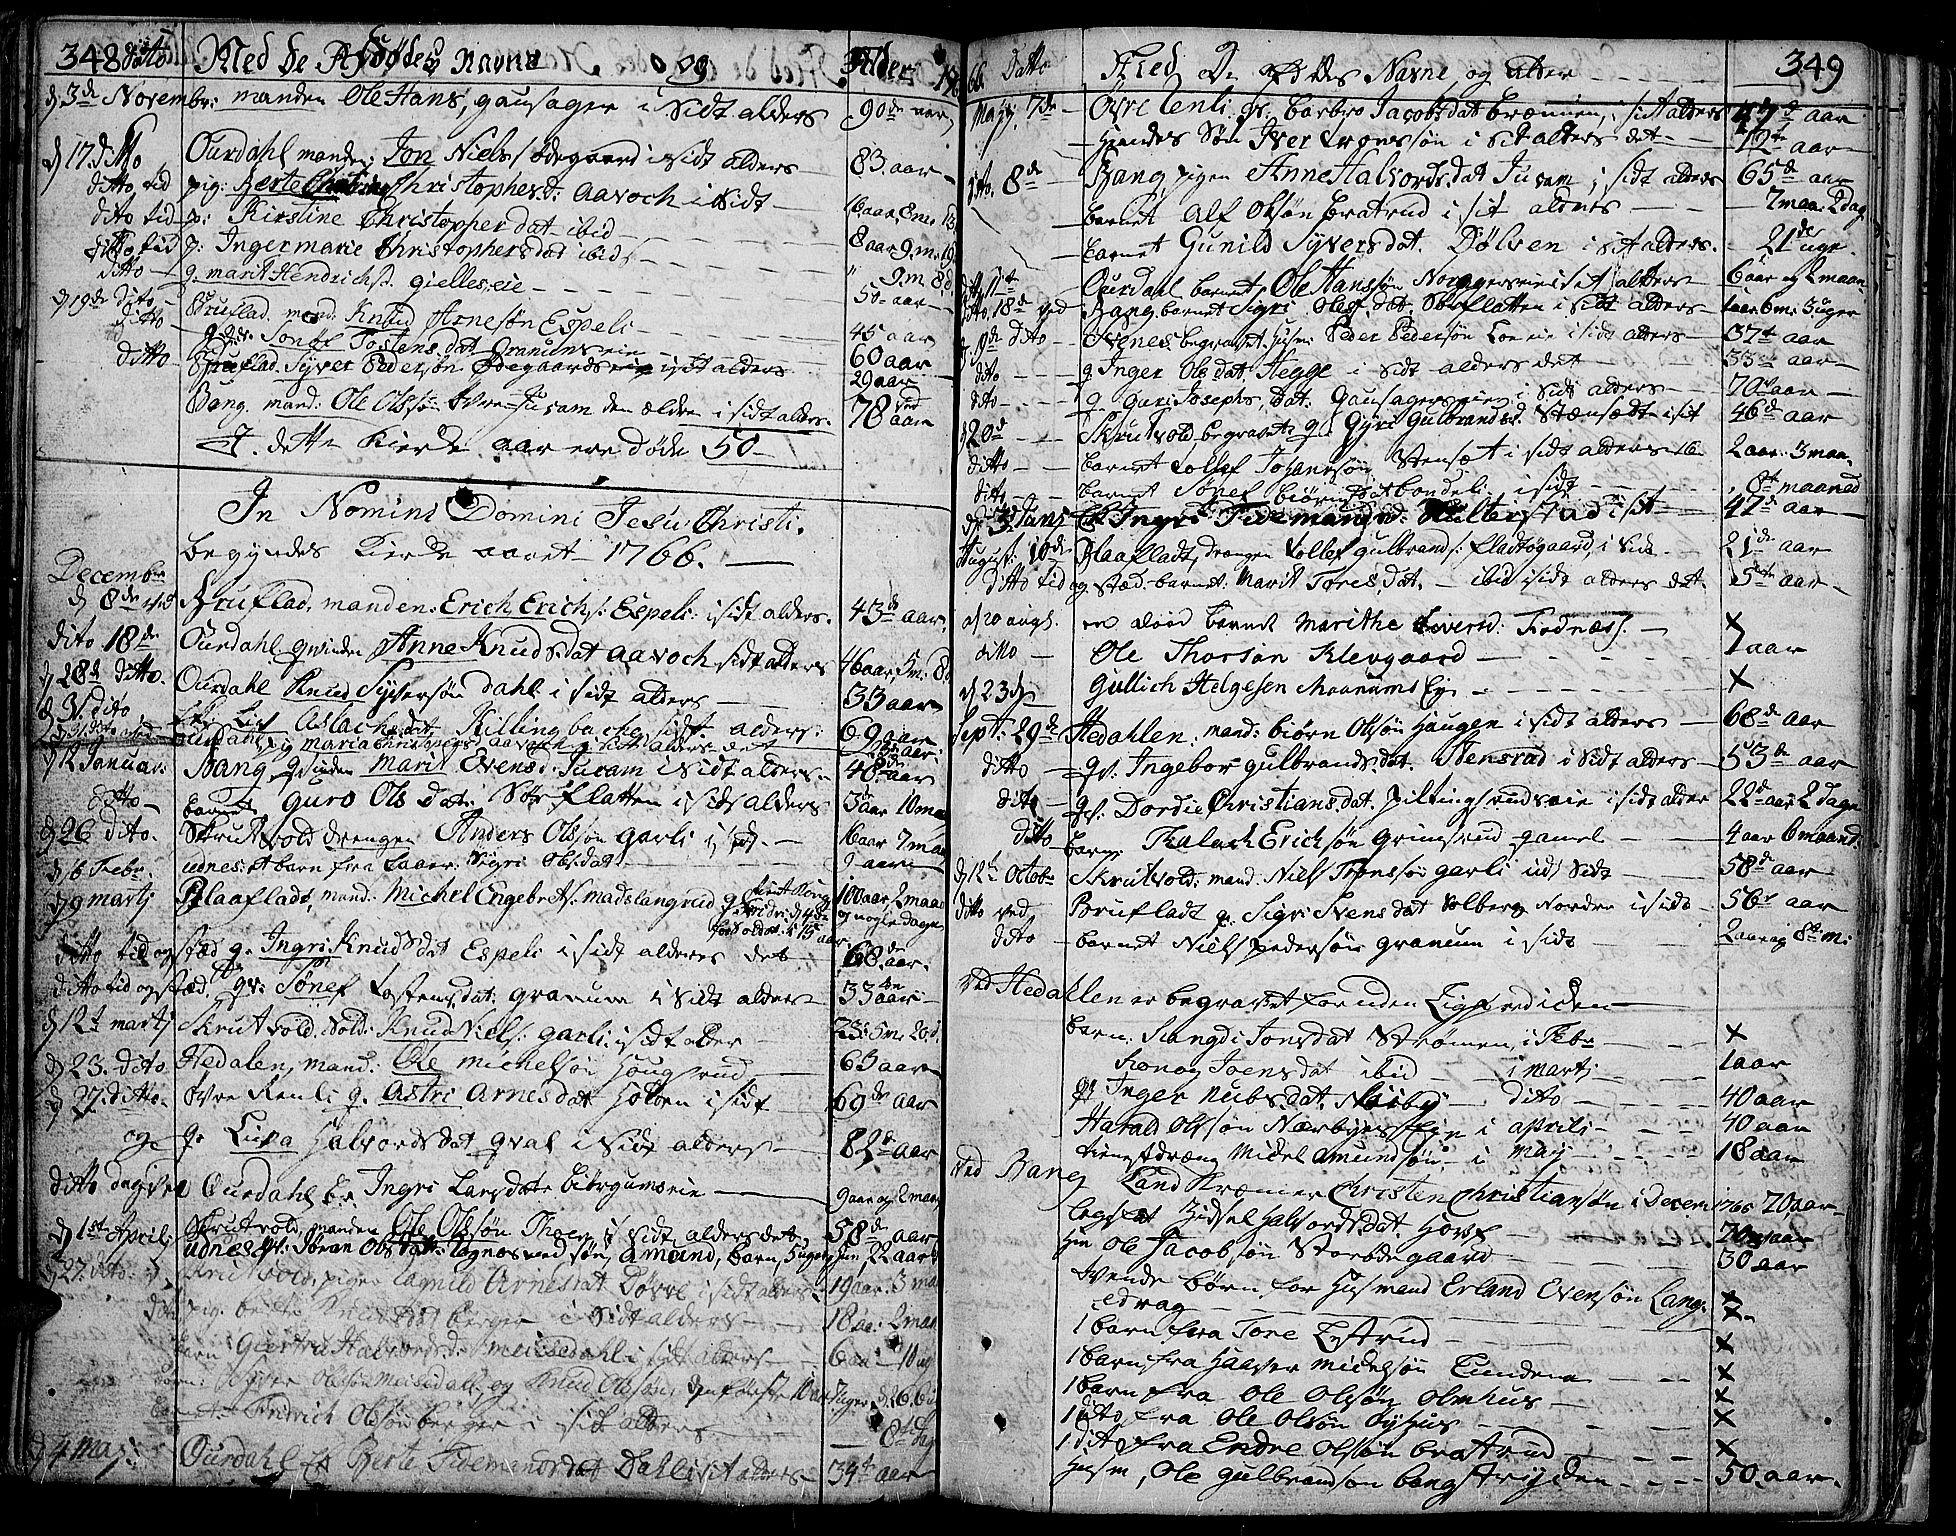 SAH, Aurdal prestekontor, Ministerialbok nr. 5, 1763-1781, s. 348-349